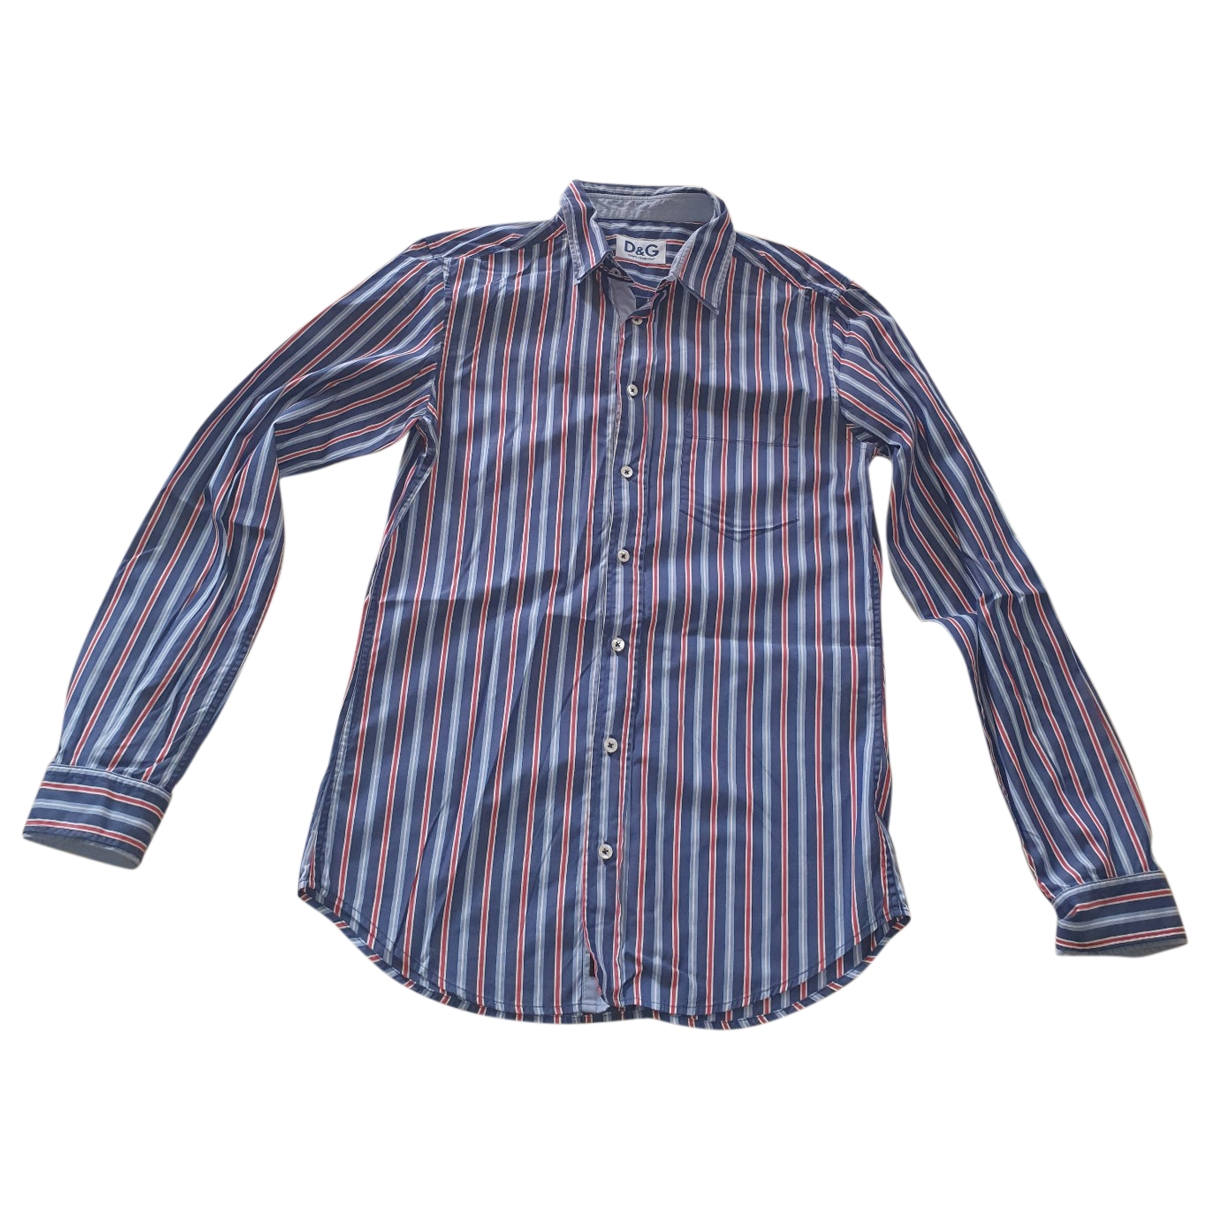 D&g \N Hemden in  Bunt Baumwolle